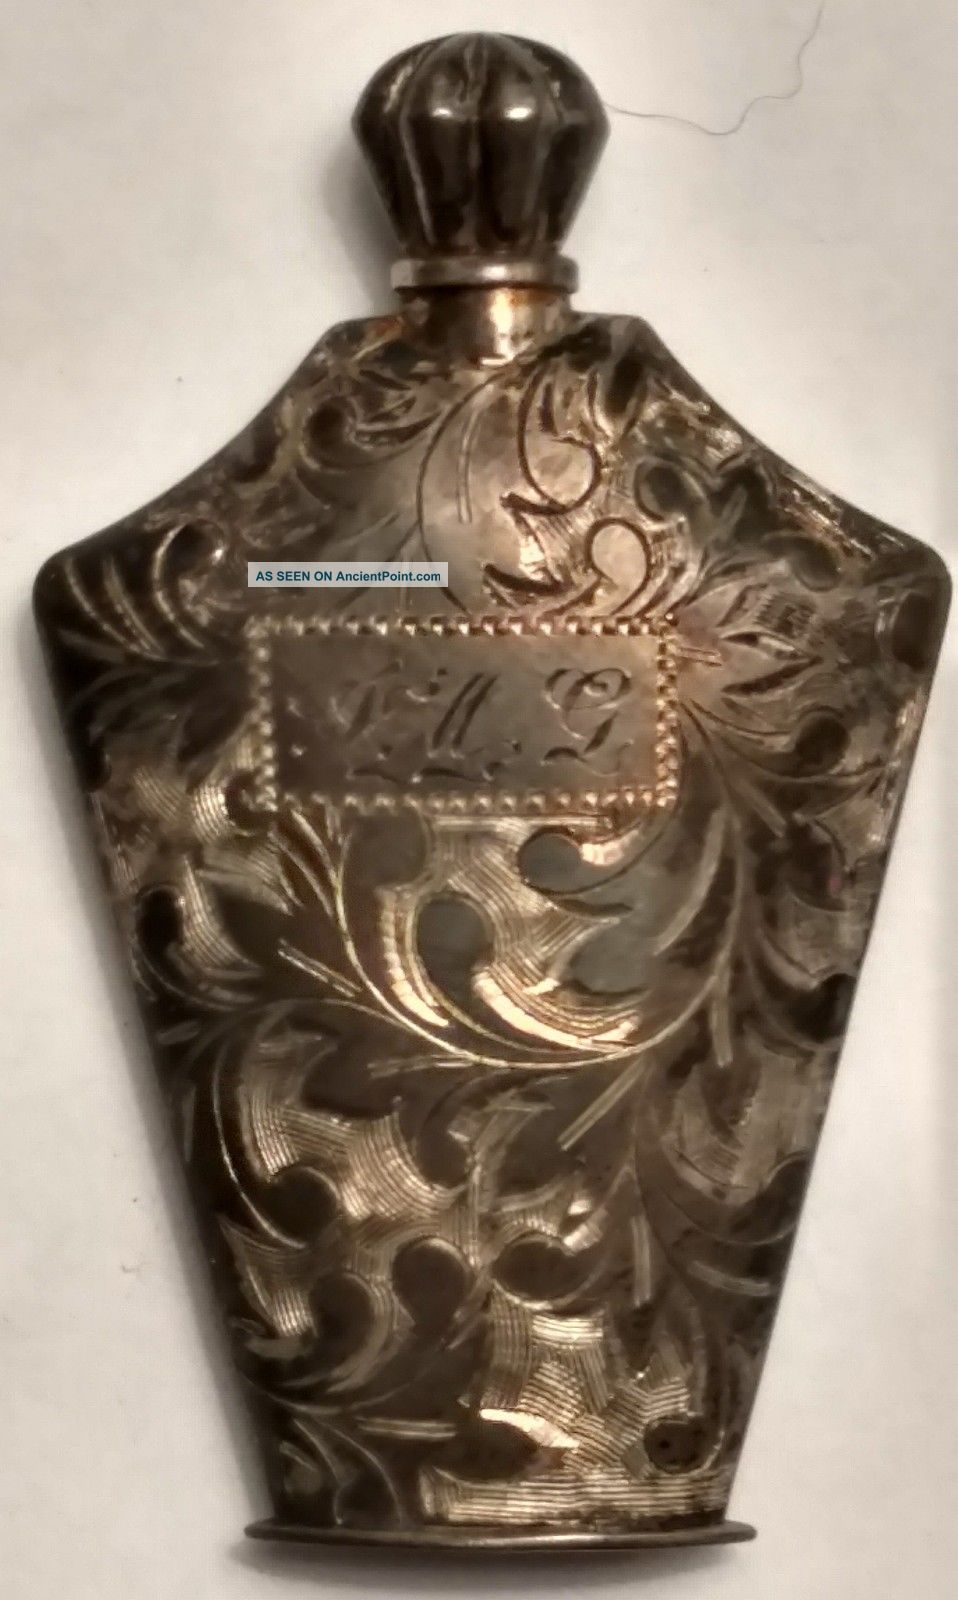 Antique Sterling Silver,  Ornately Engraved Perfume Bottle Bottles, Decanters & Flasks photo